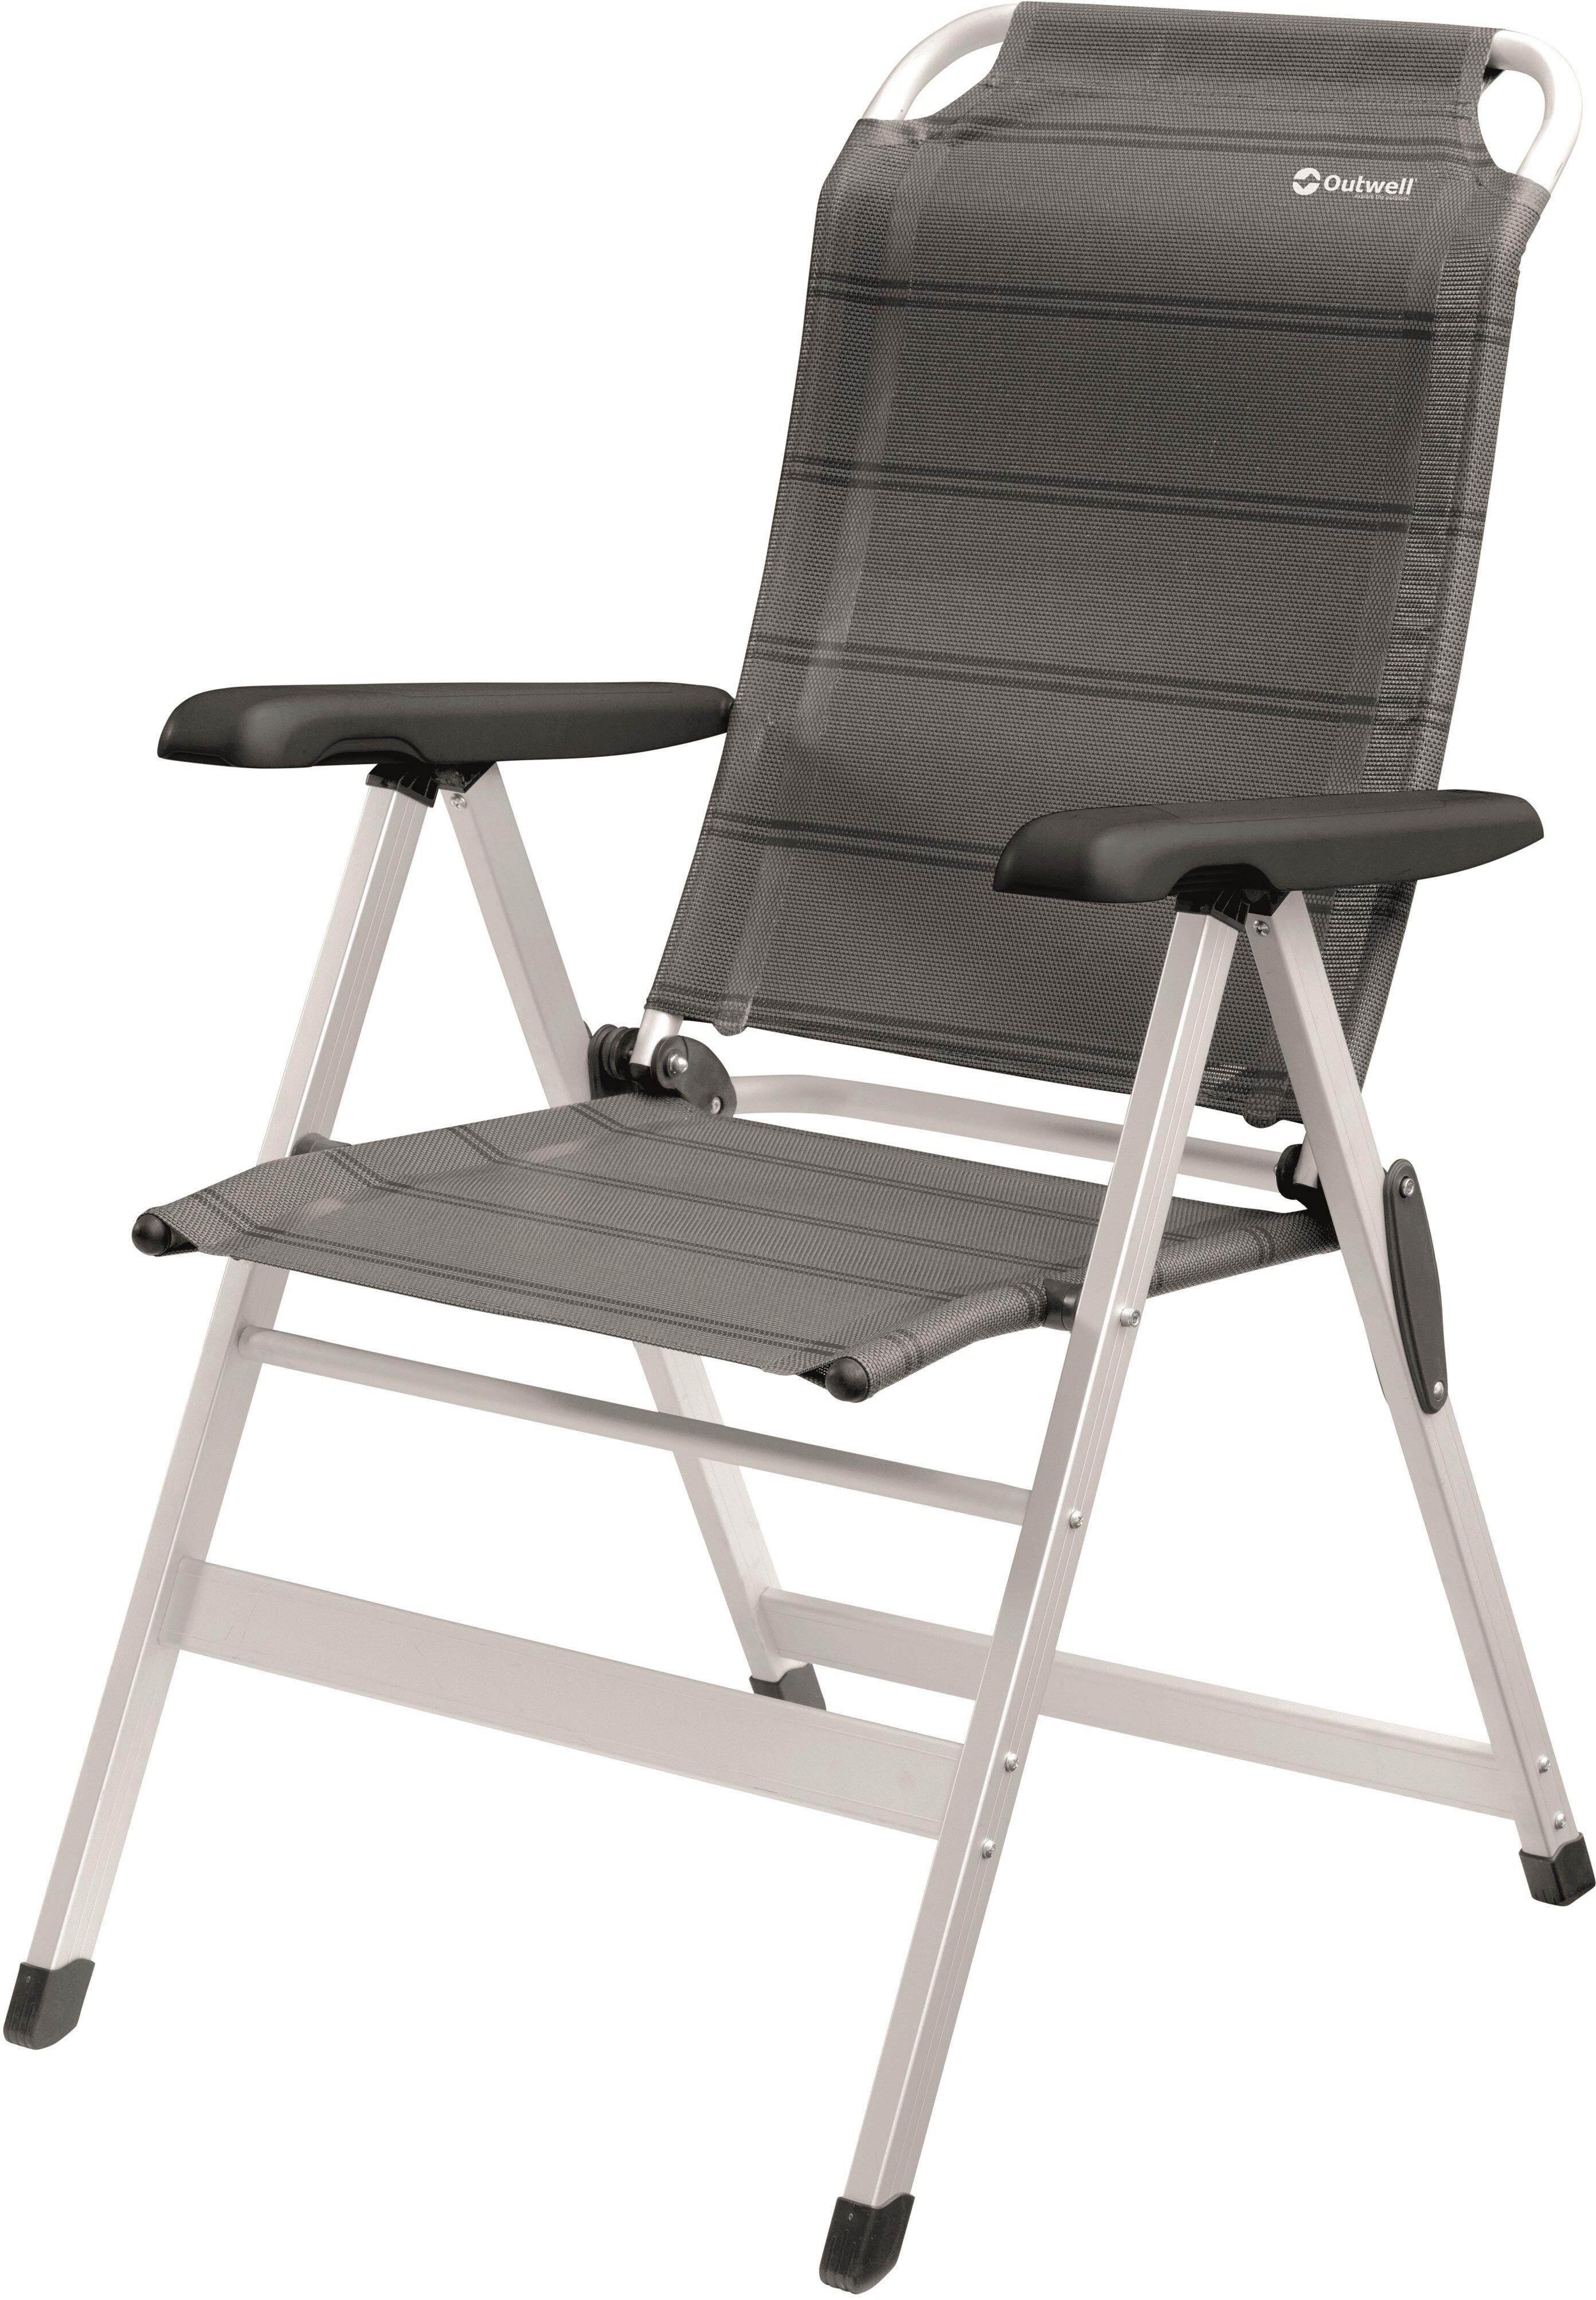 Outwell Ontario Folding Chair Campz De